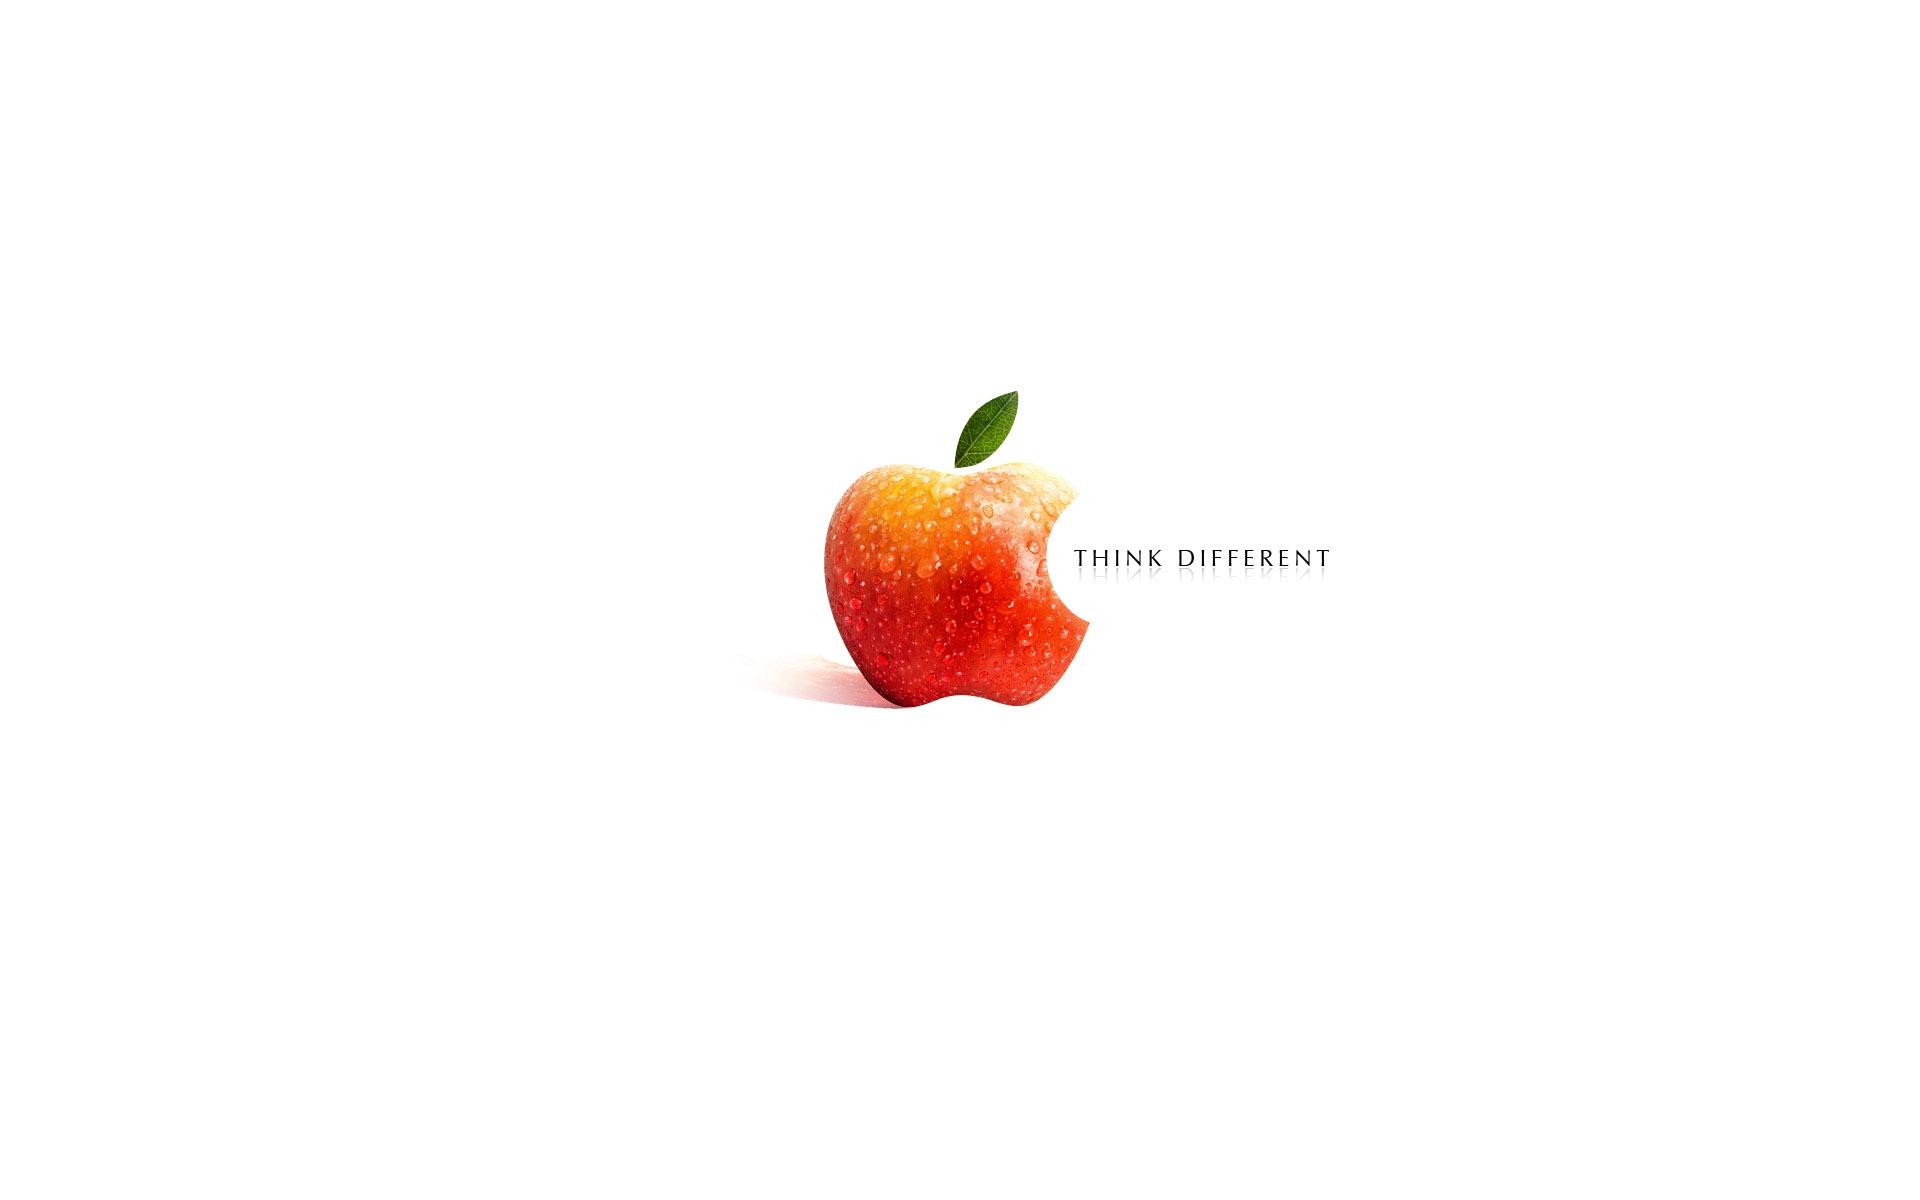 original apple wallpaper,natural foods,fruit,plant,food,accessory fruit